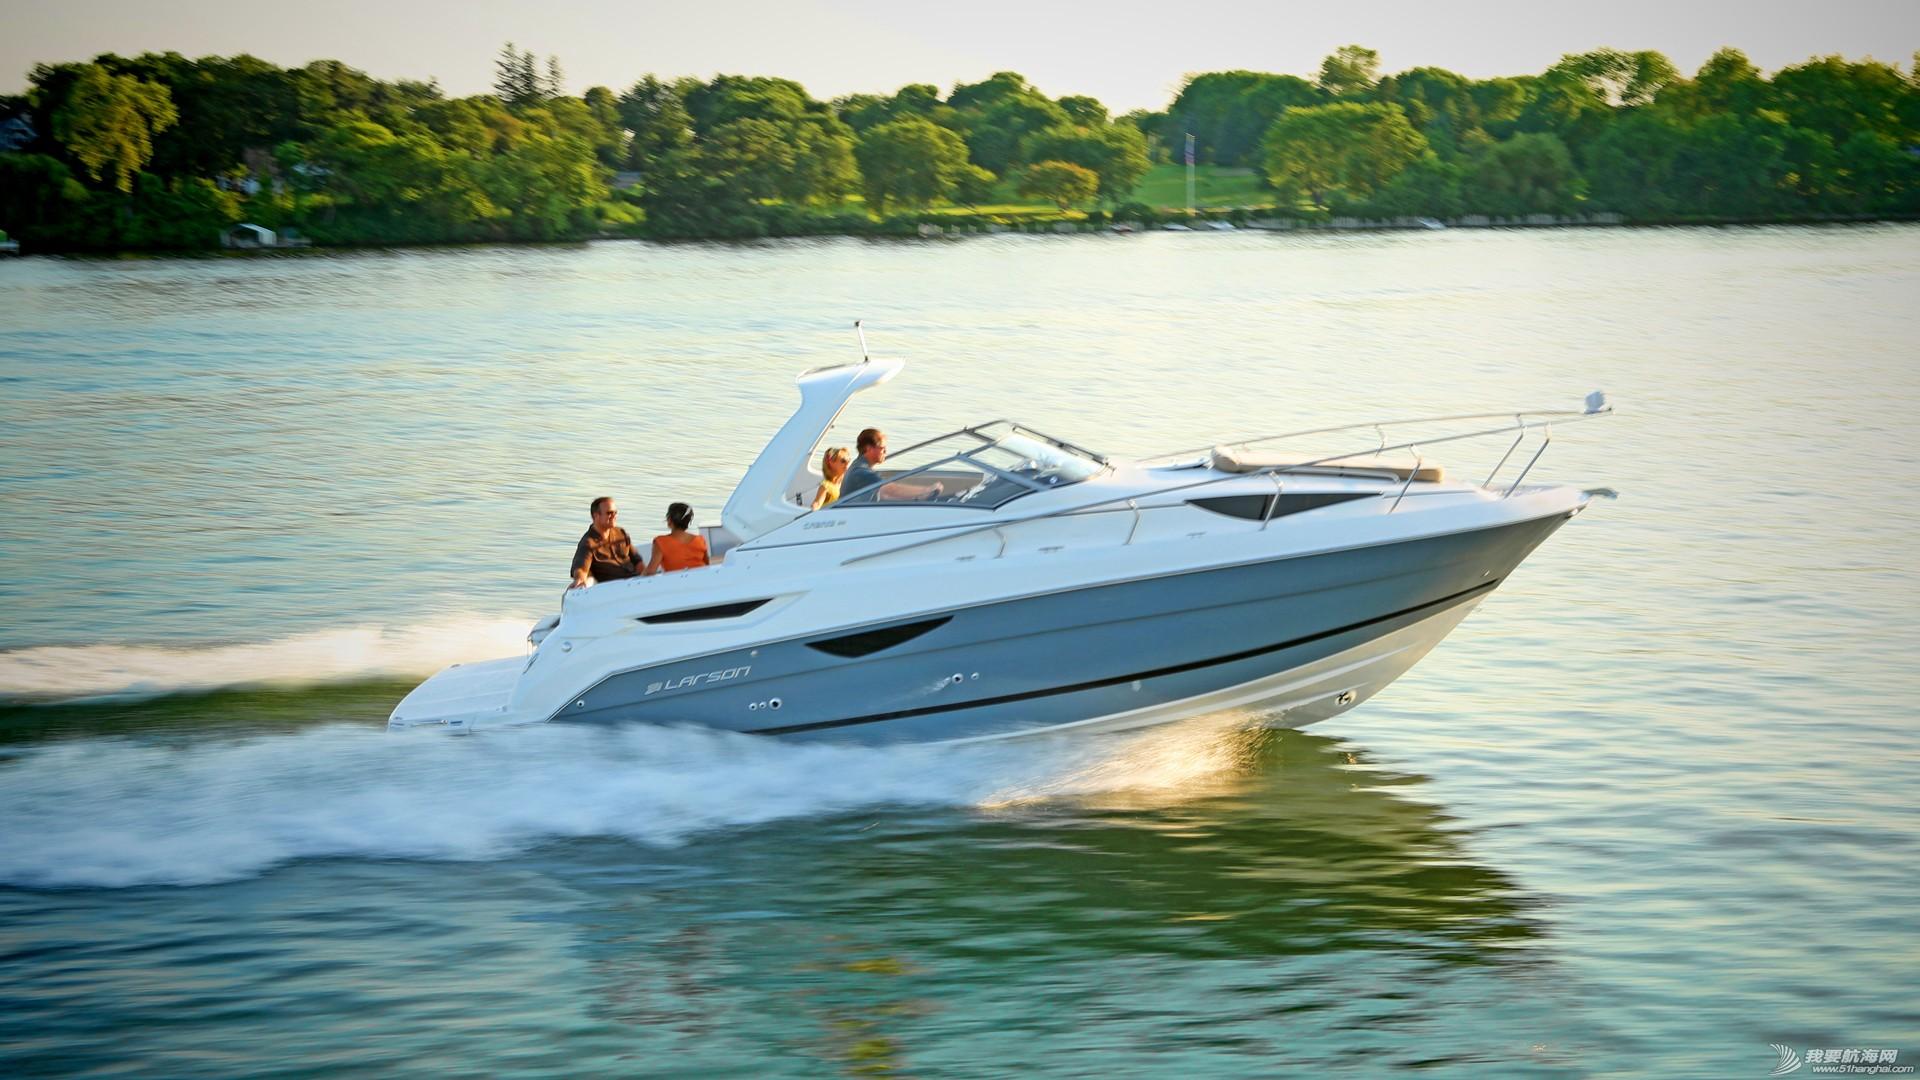 nbsp,尔森,Larson,游艇,自己 美国进口游艇拉尔森CABRIO 315,现船销售  134407wfueo9e6ee9dhq9z